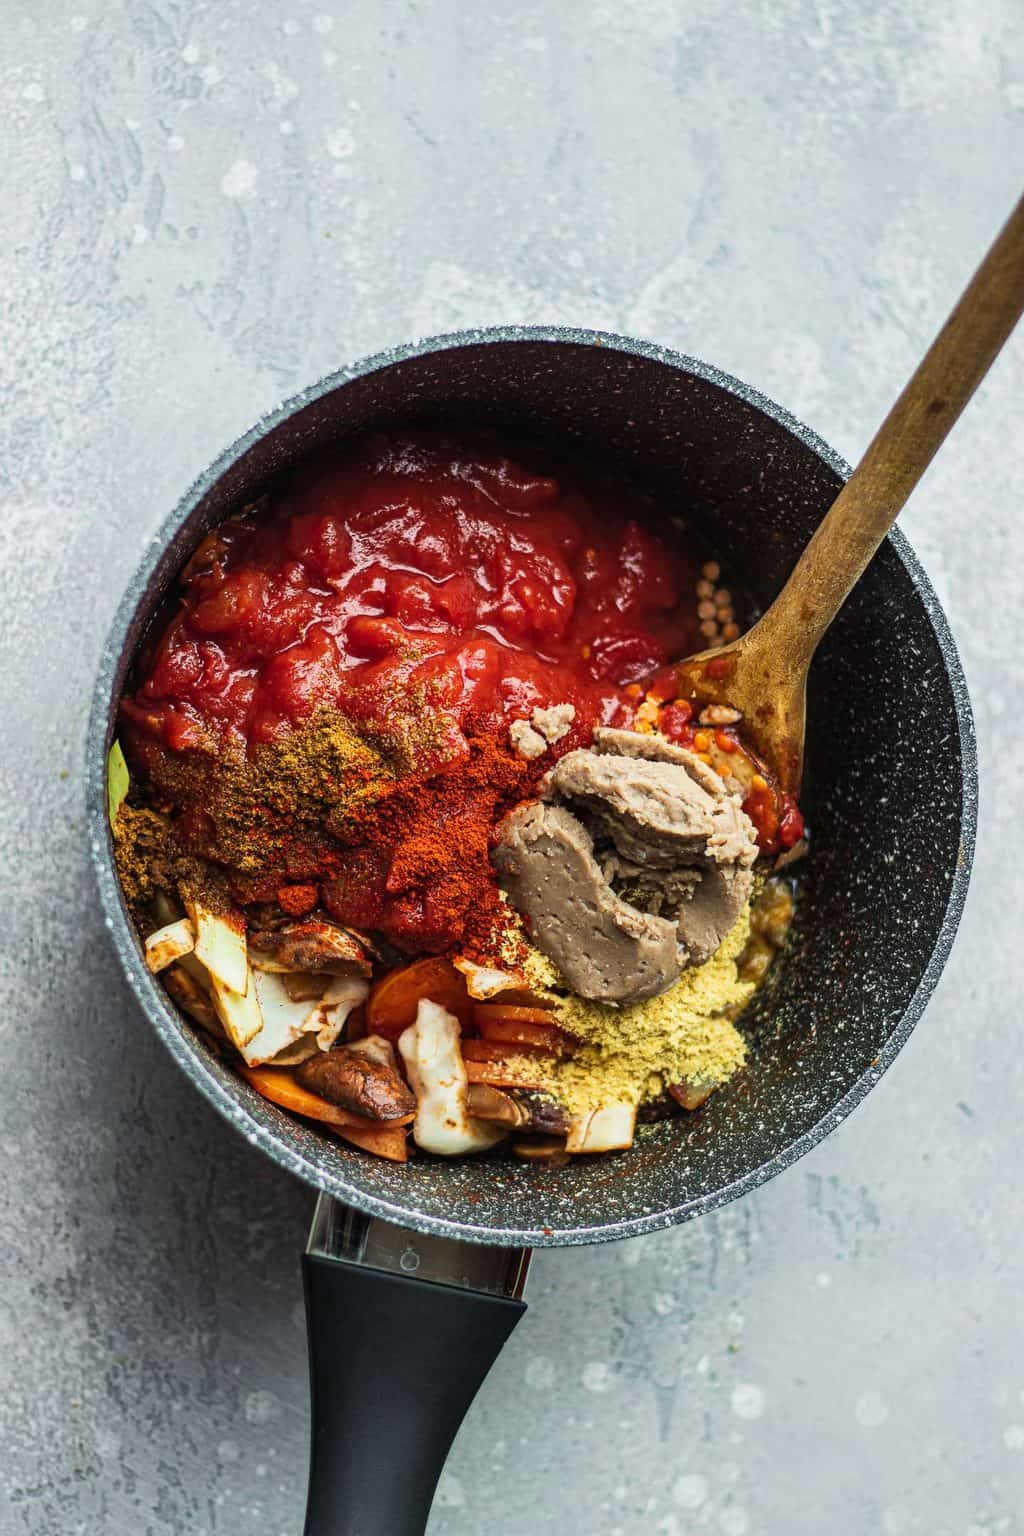 Lentil bolognese ingredients in a saucepan